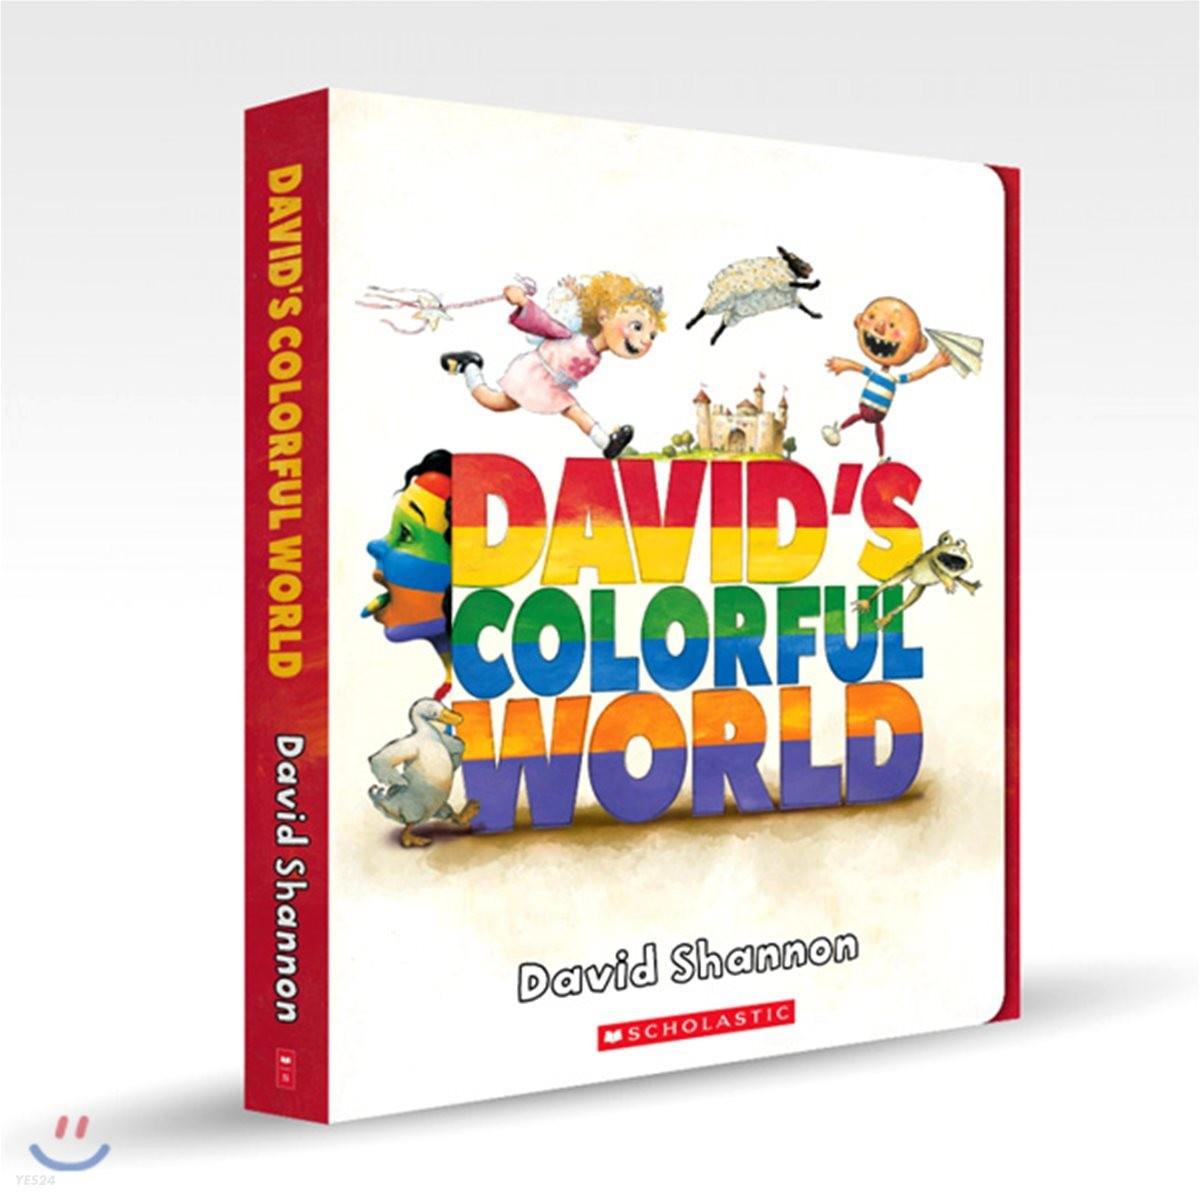 David's Colorful World